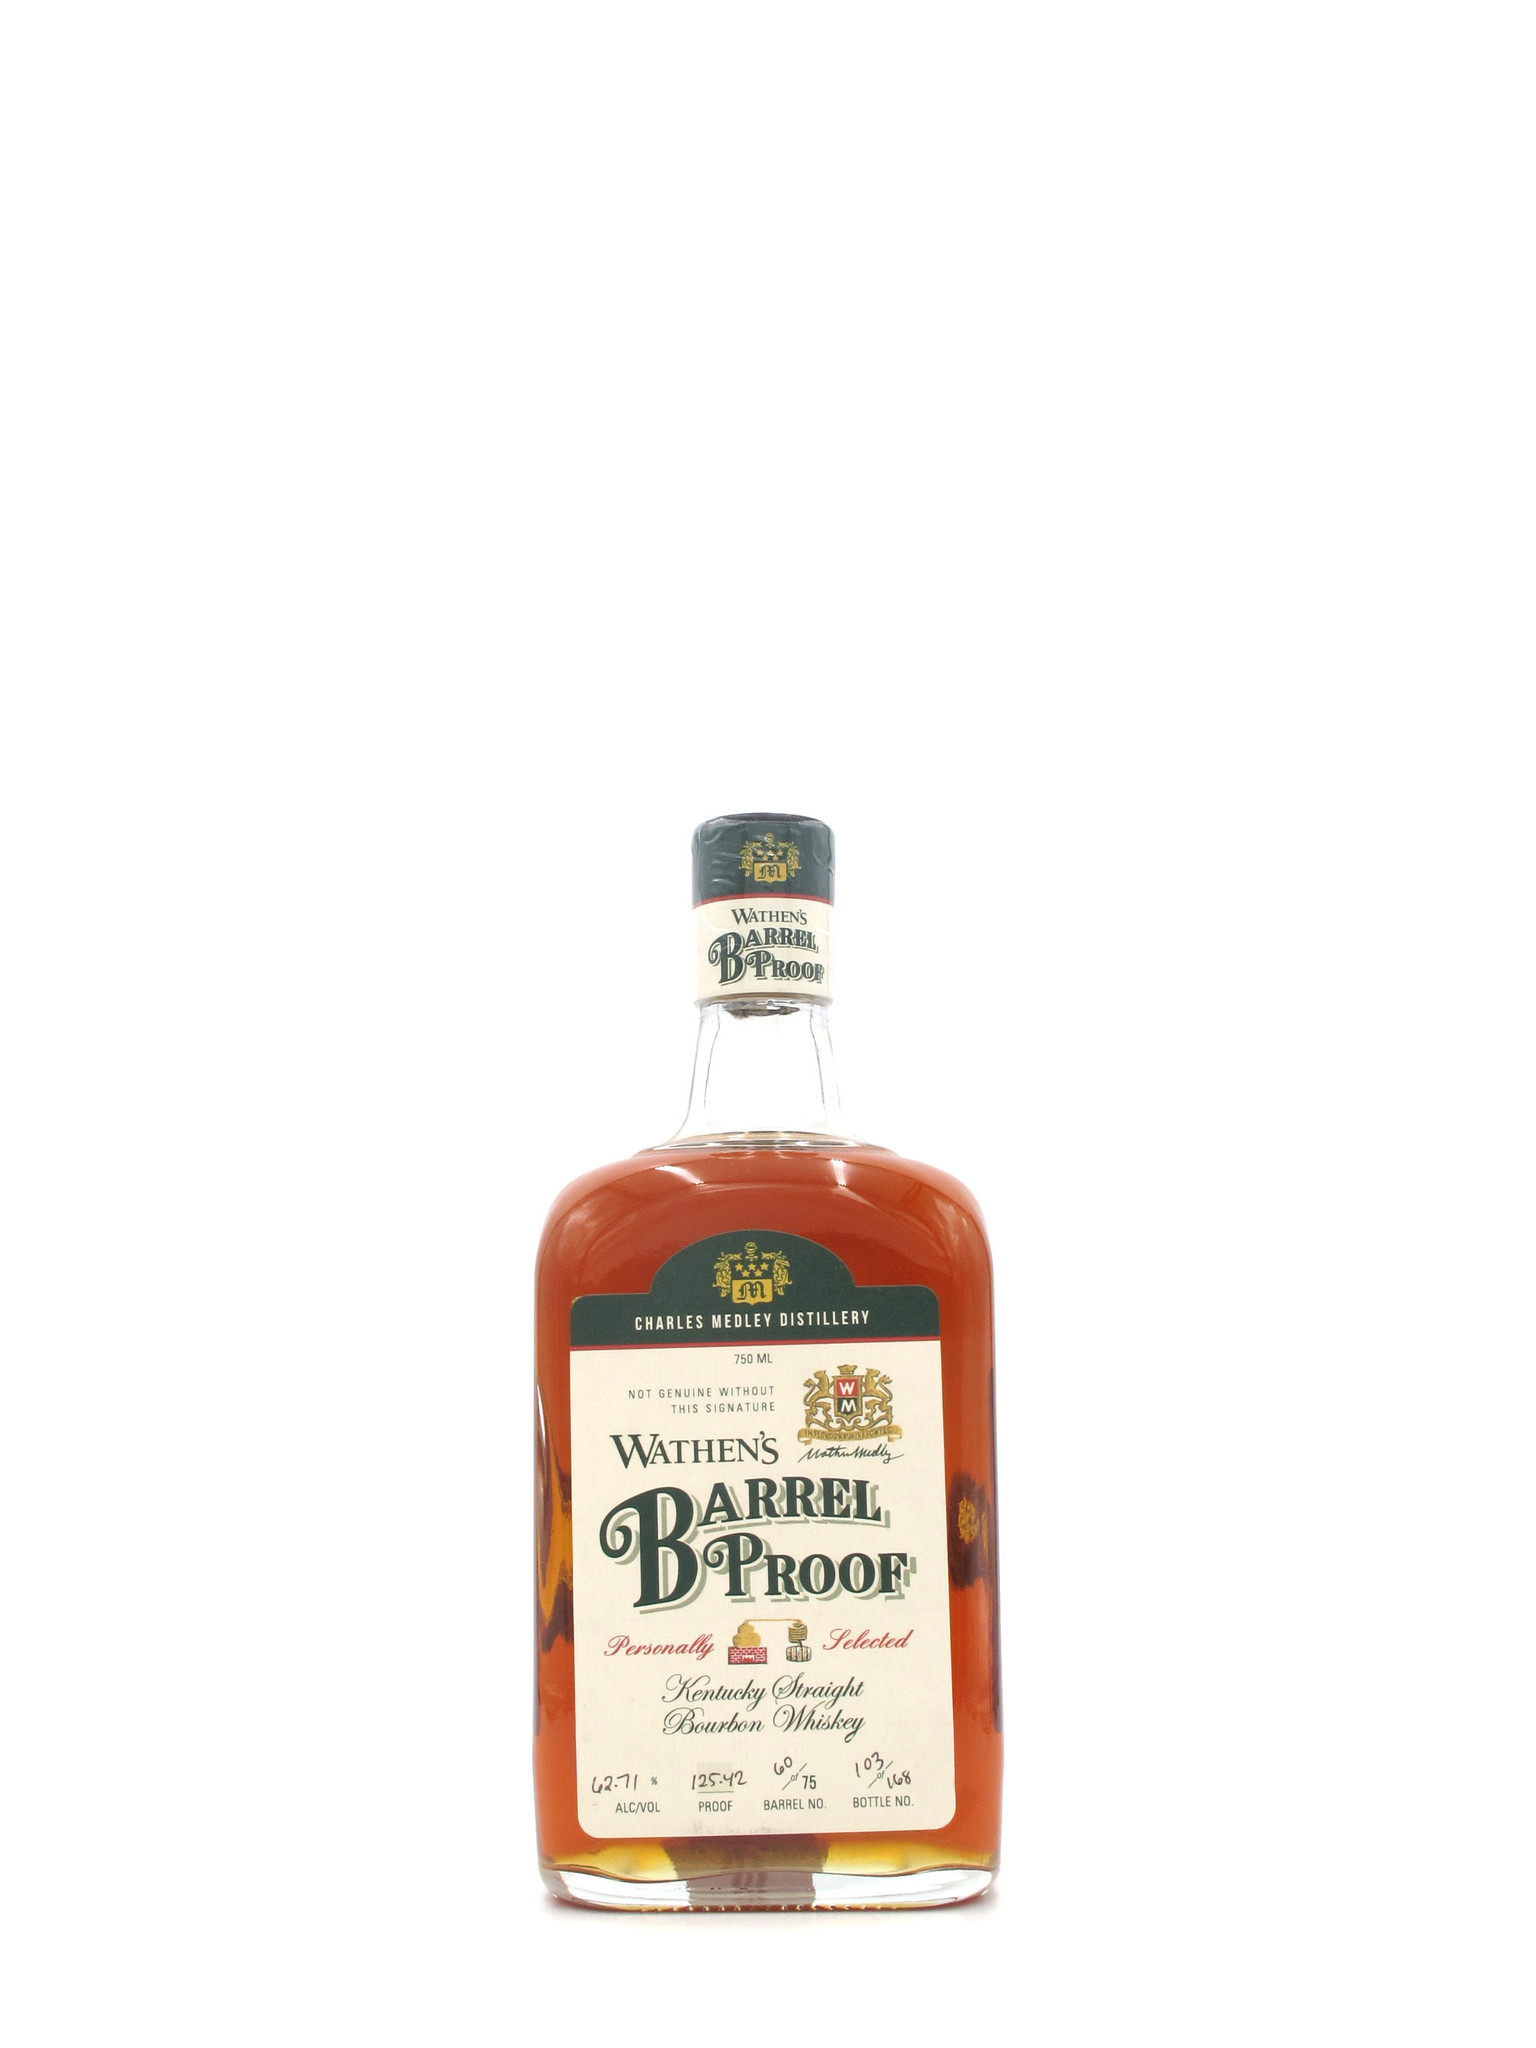 Medley Brothers Wathen's Single Barrel No. 60 Barrel Proof Kentucky Straight Bourbon 750ml